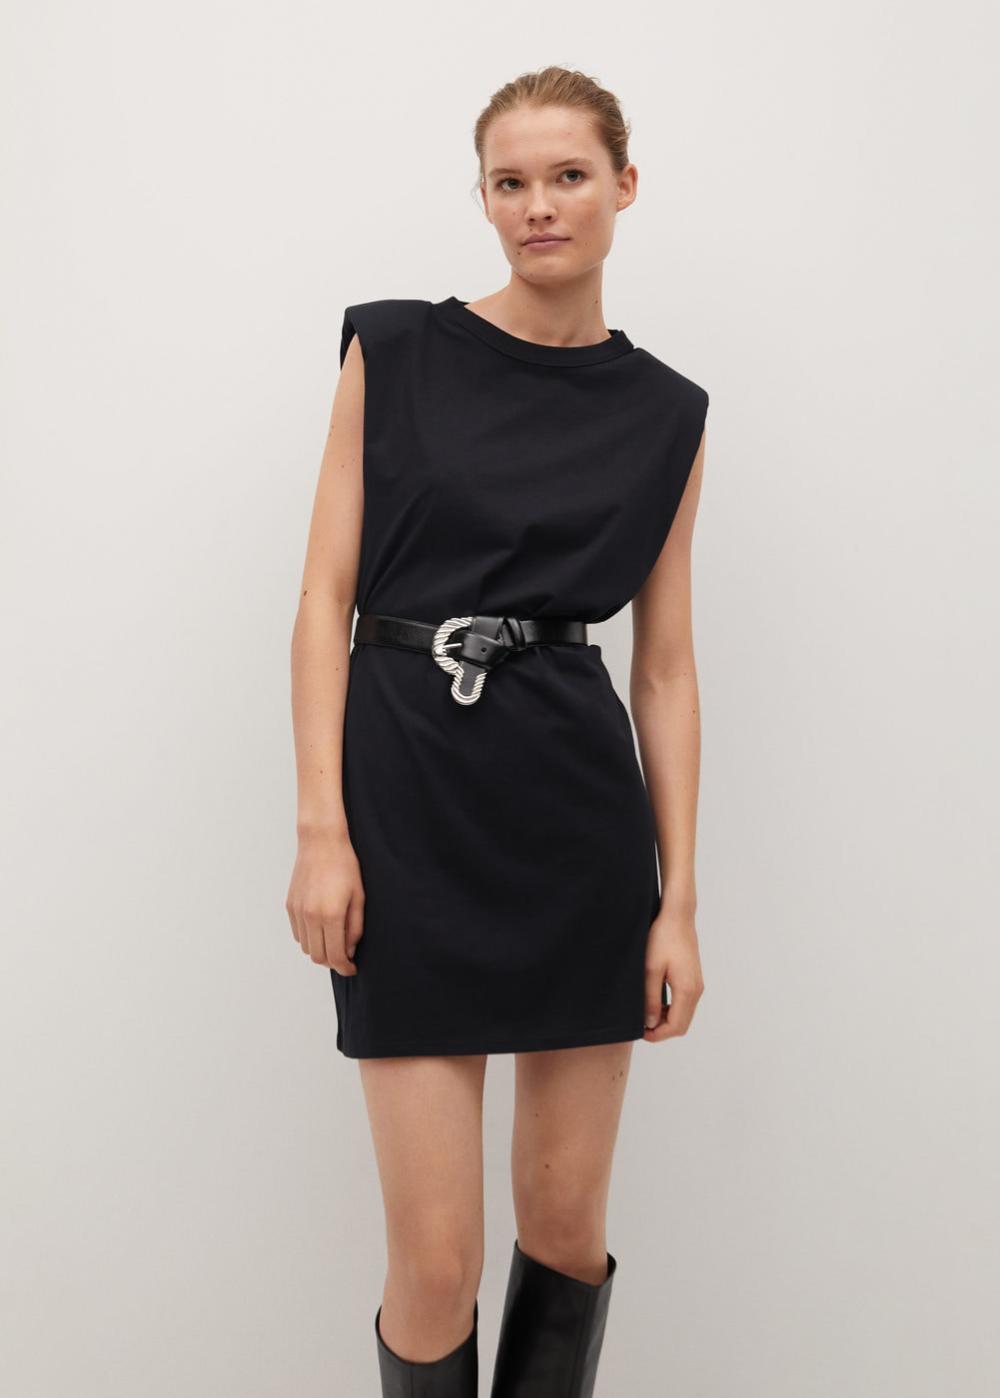 Shoulder Pad Dress Women Mango Usa In 2021 Shoulder Pad Dress Jumpsuits For Women Black Dress [ 1398 x 1000 Pixel ]